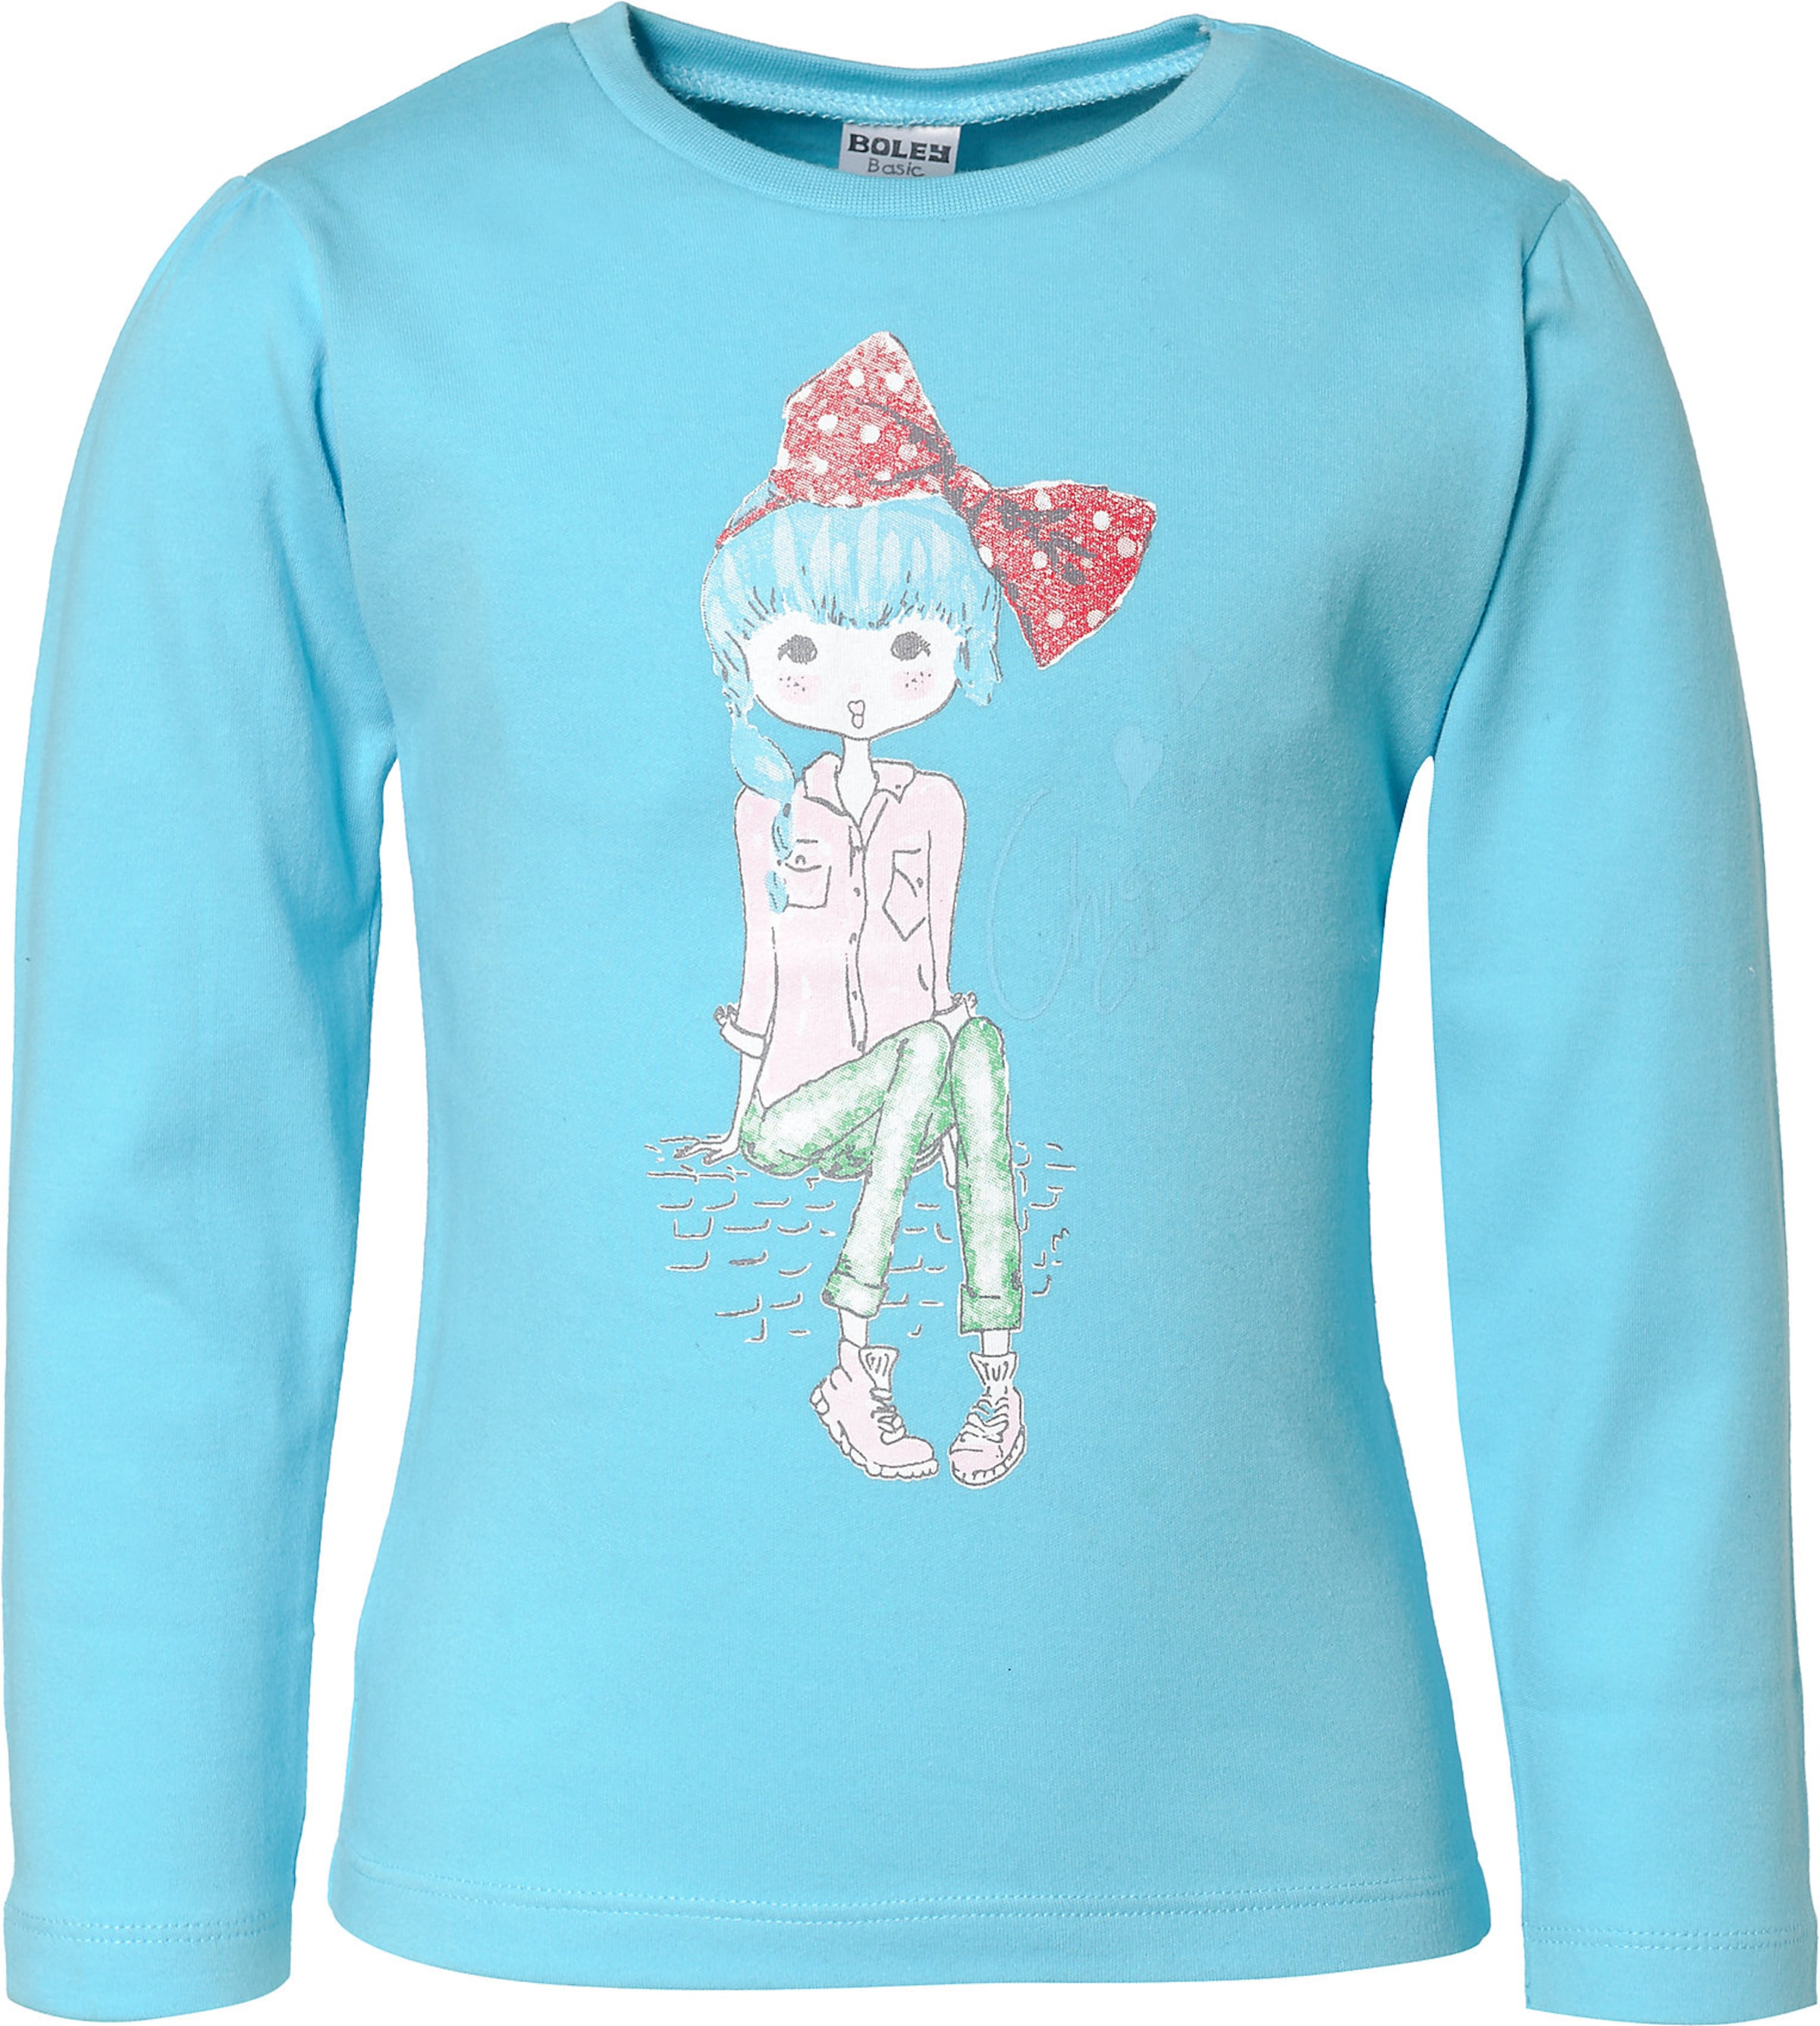 Kinder,  Mädchen,  Kinder Boley Shirt aqua,  blau,  blau, khaki | 04001742653550